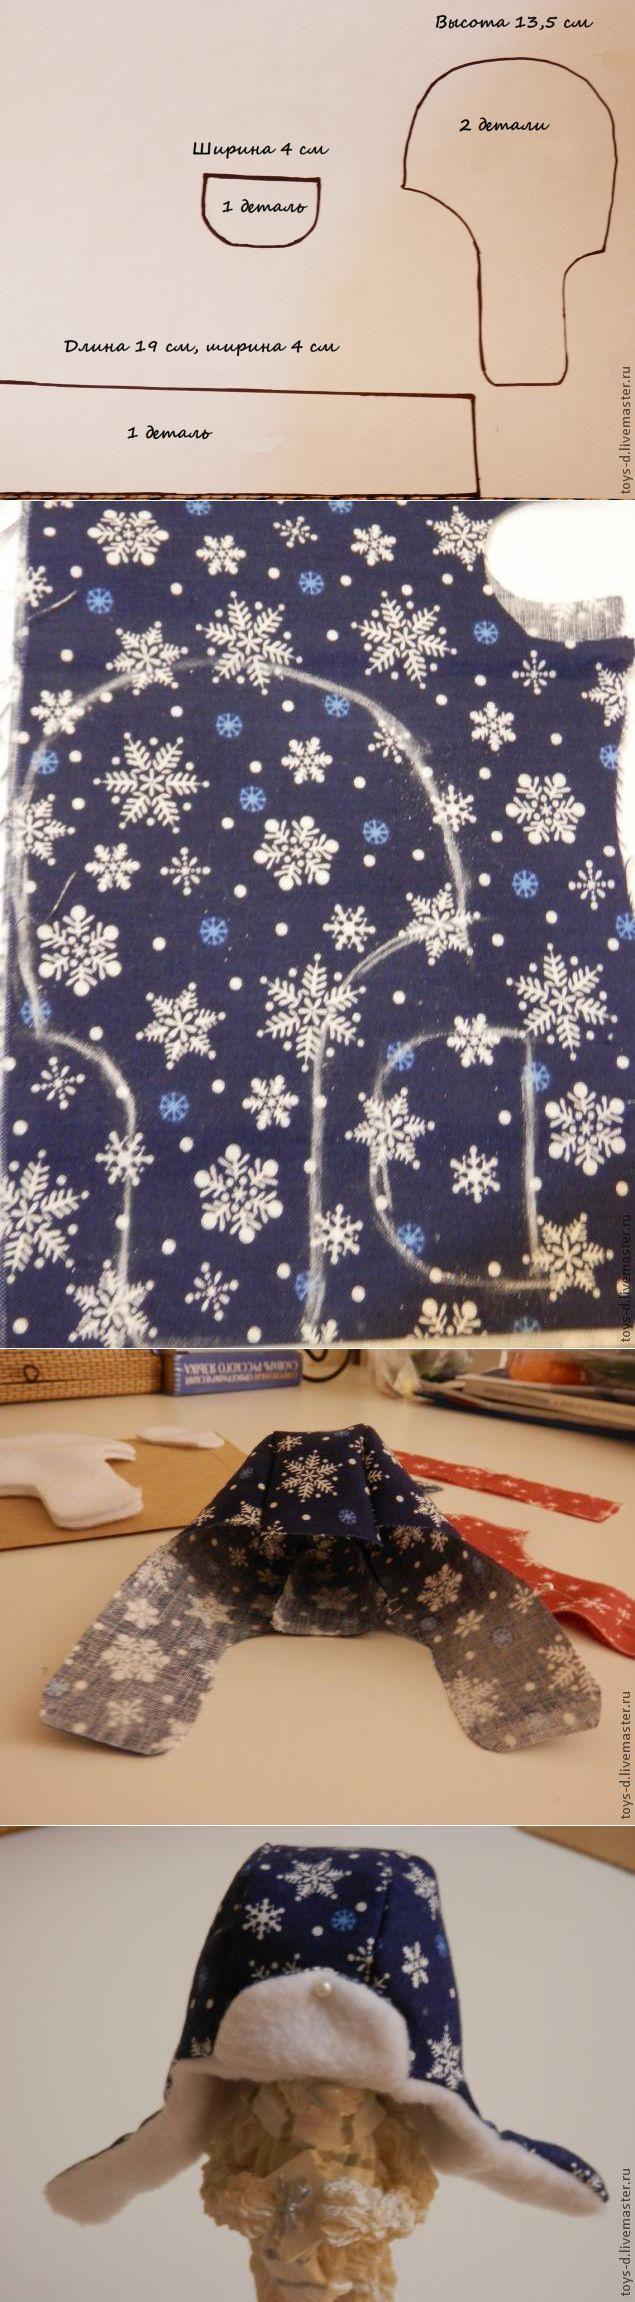 Готовимся к зиме! Шьем шапку-ушанку - Ярмарка Мастеров - ручная работа, handmade